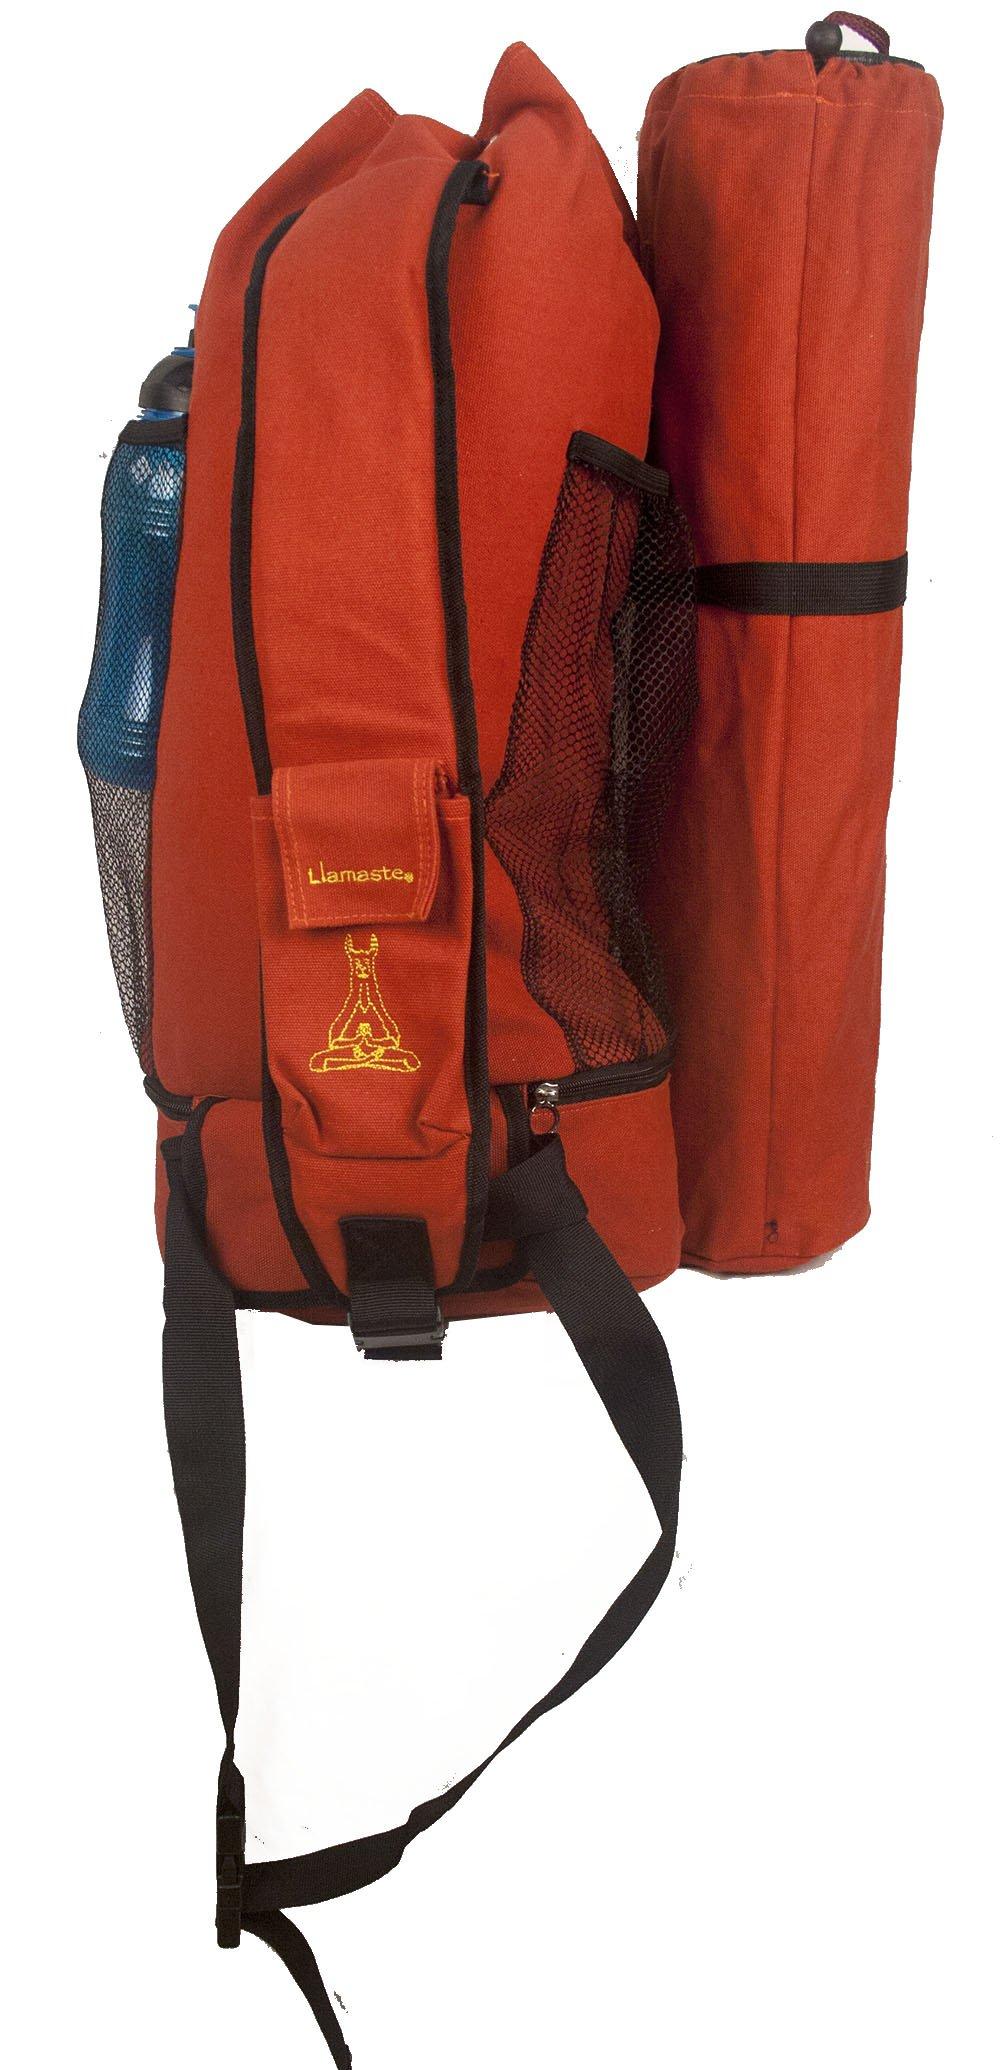 Llamaste Premium Edition Yoga Mat Duffle Bag by Llamaste (Image #2)